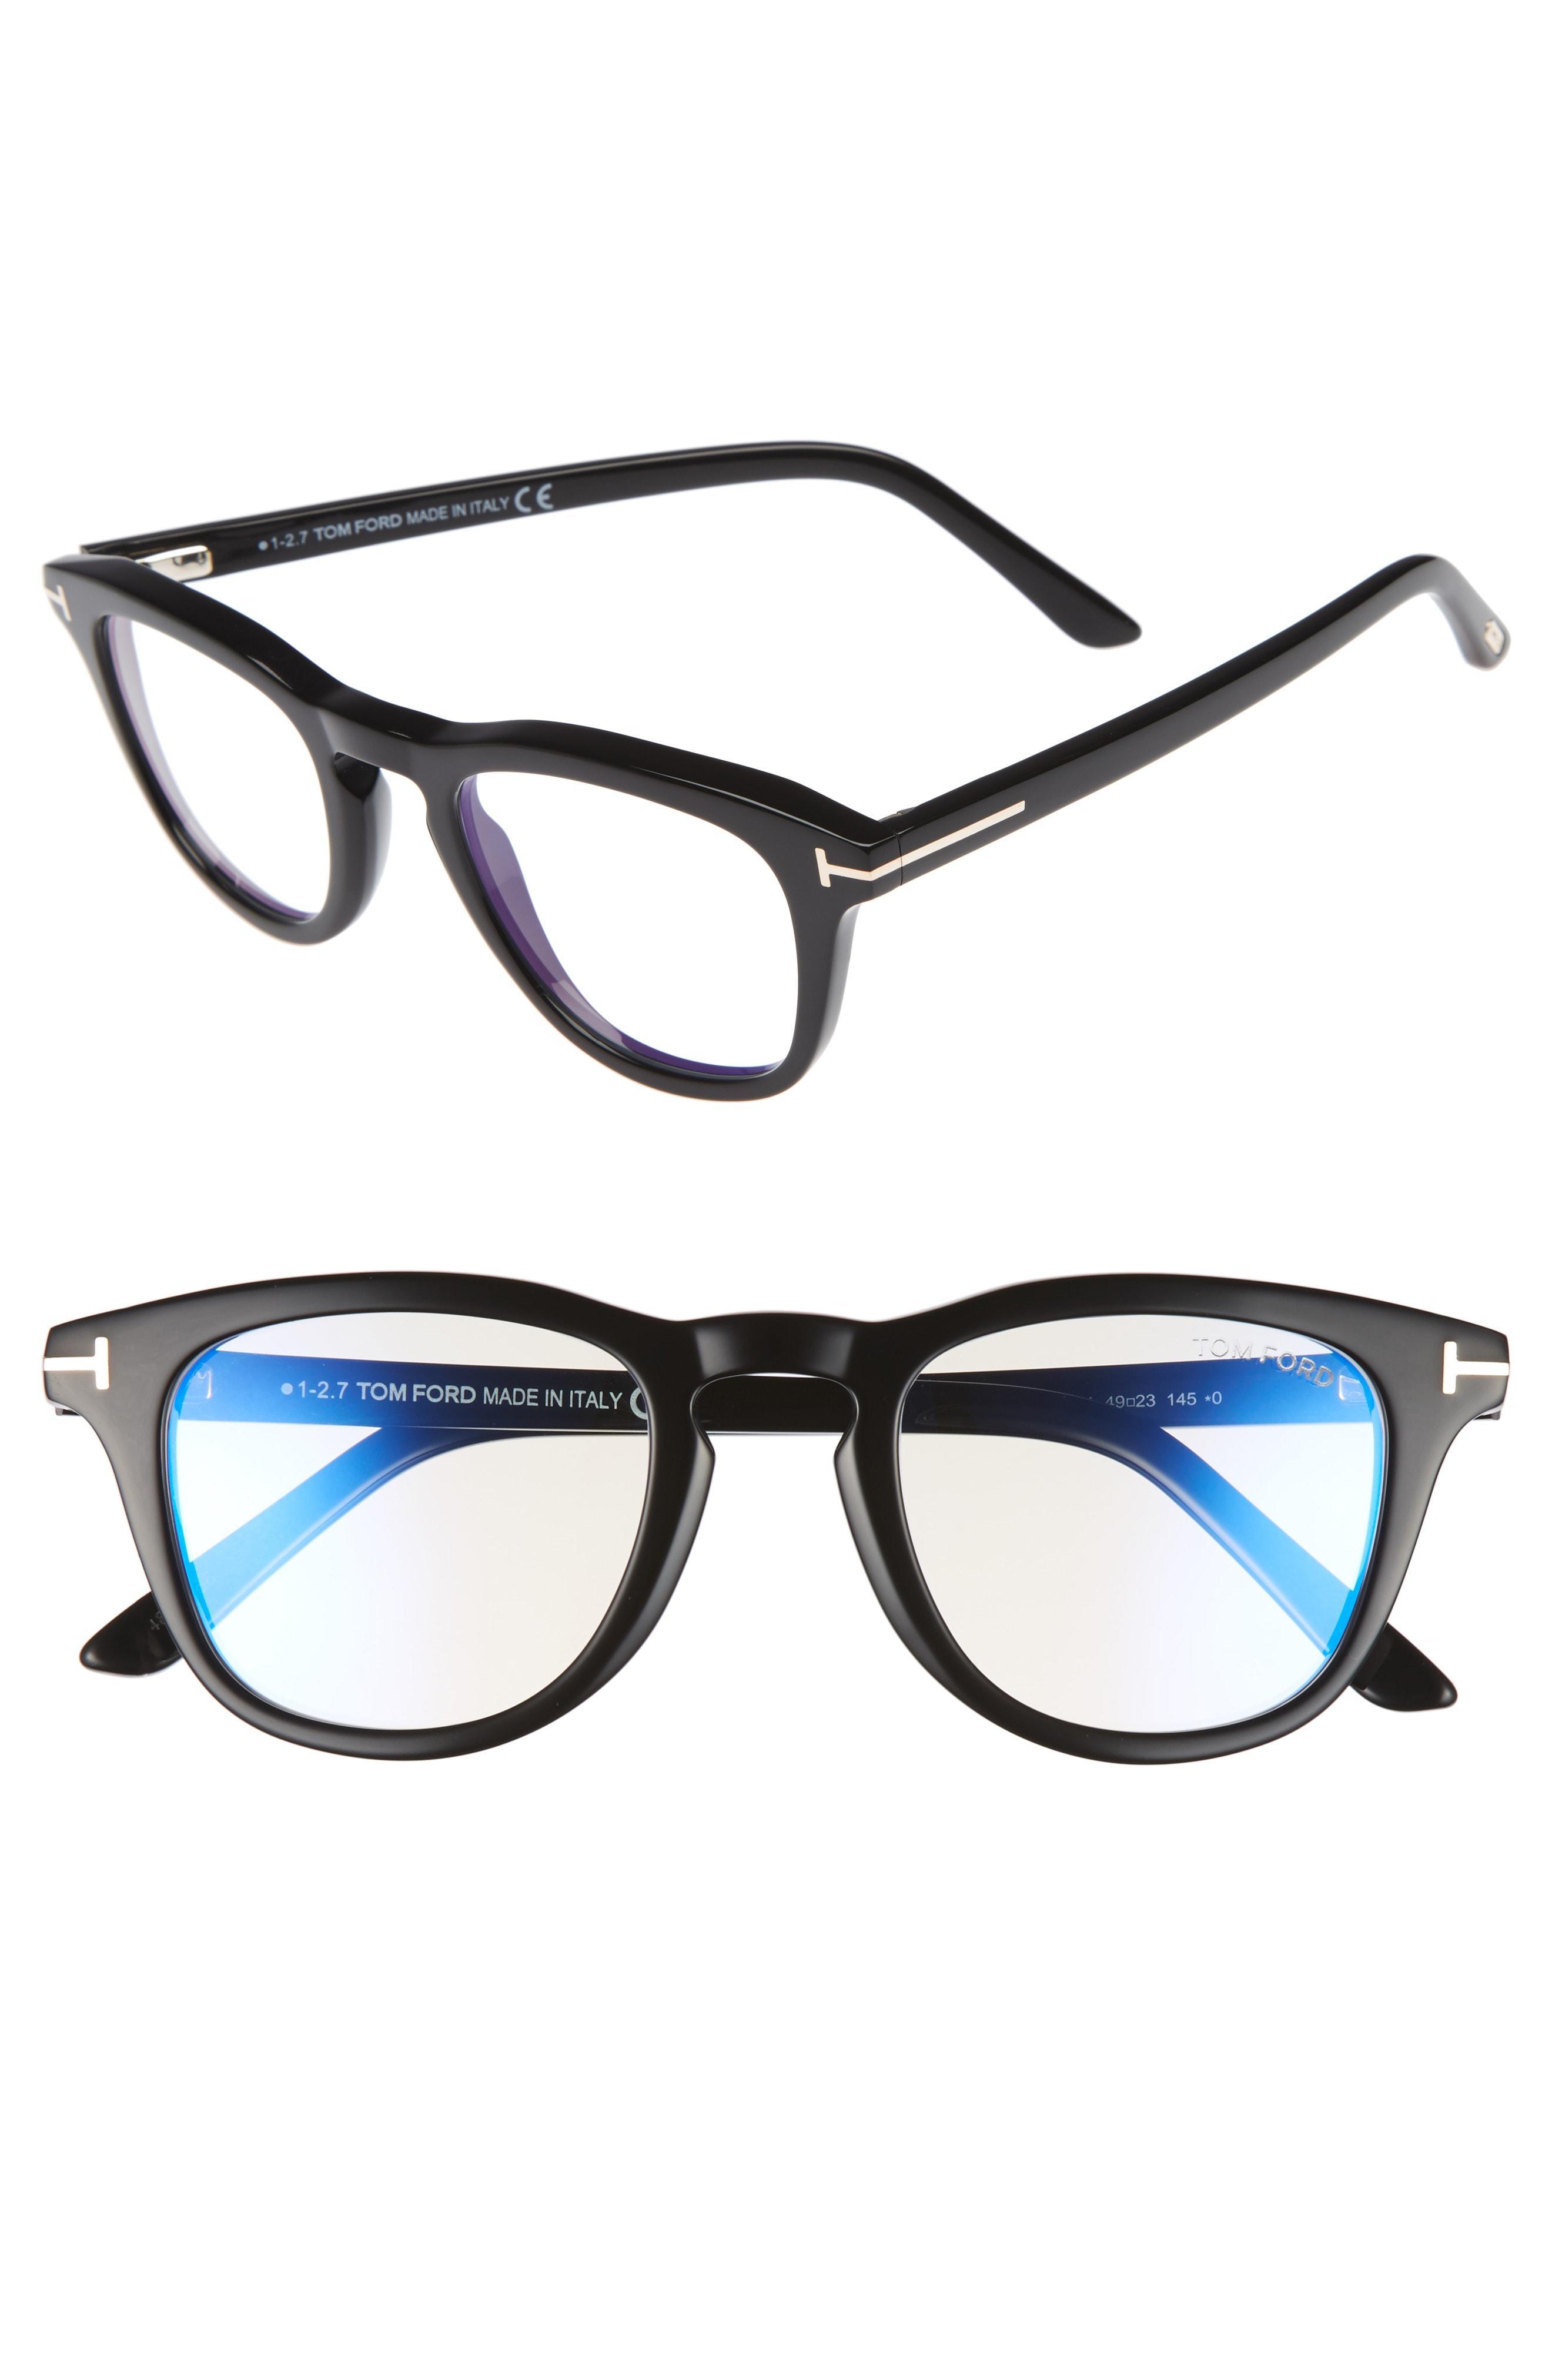 654d09c634 Lyst - Tom Ford 49mm Blue Light Blocking Glasses - Shiny Black  Blue ...